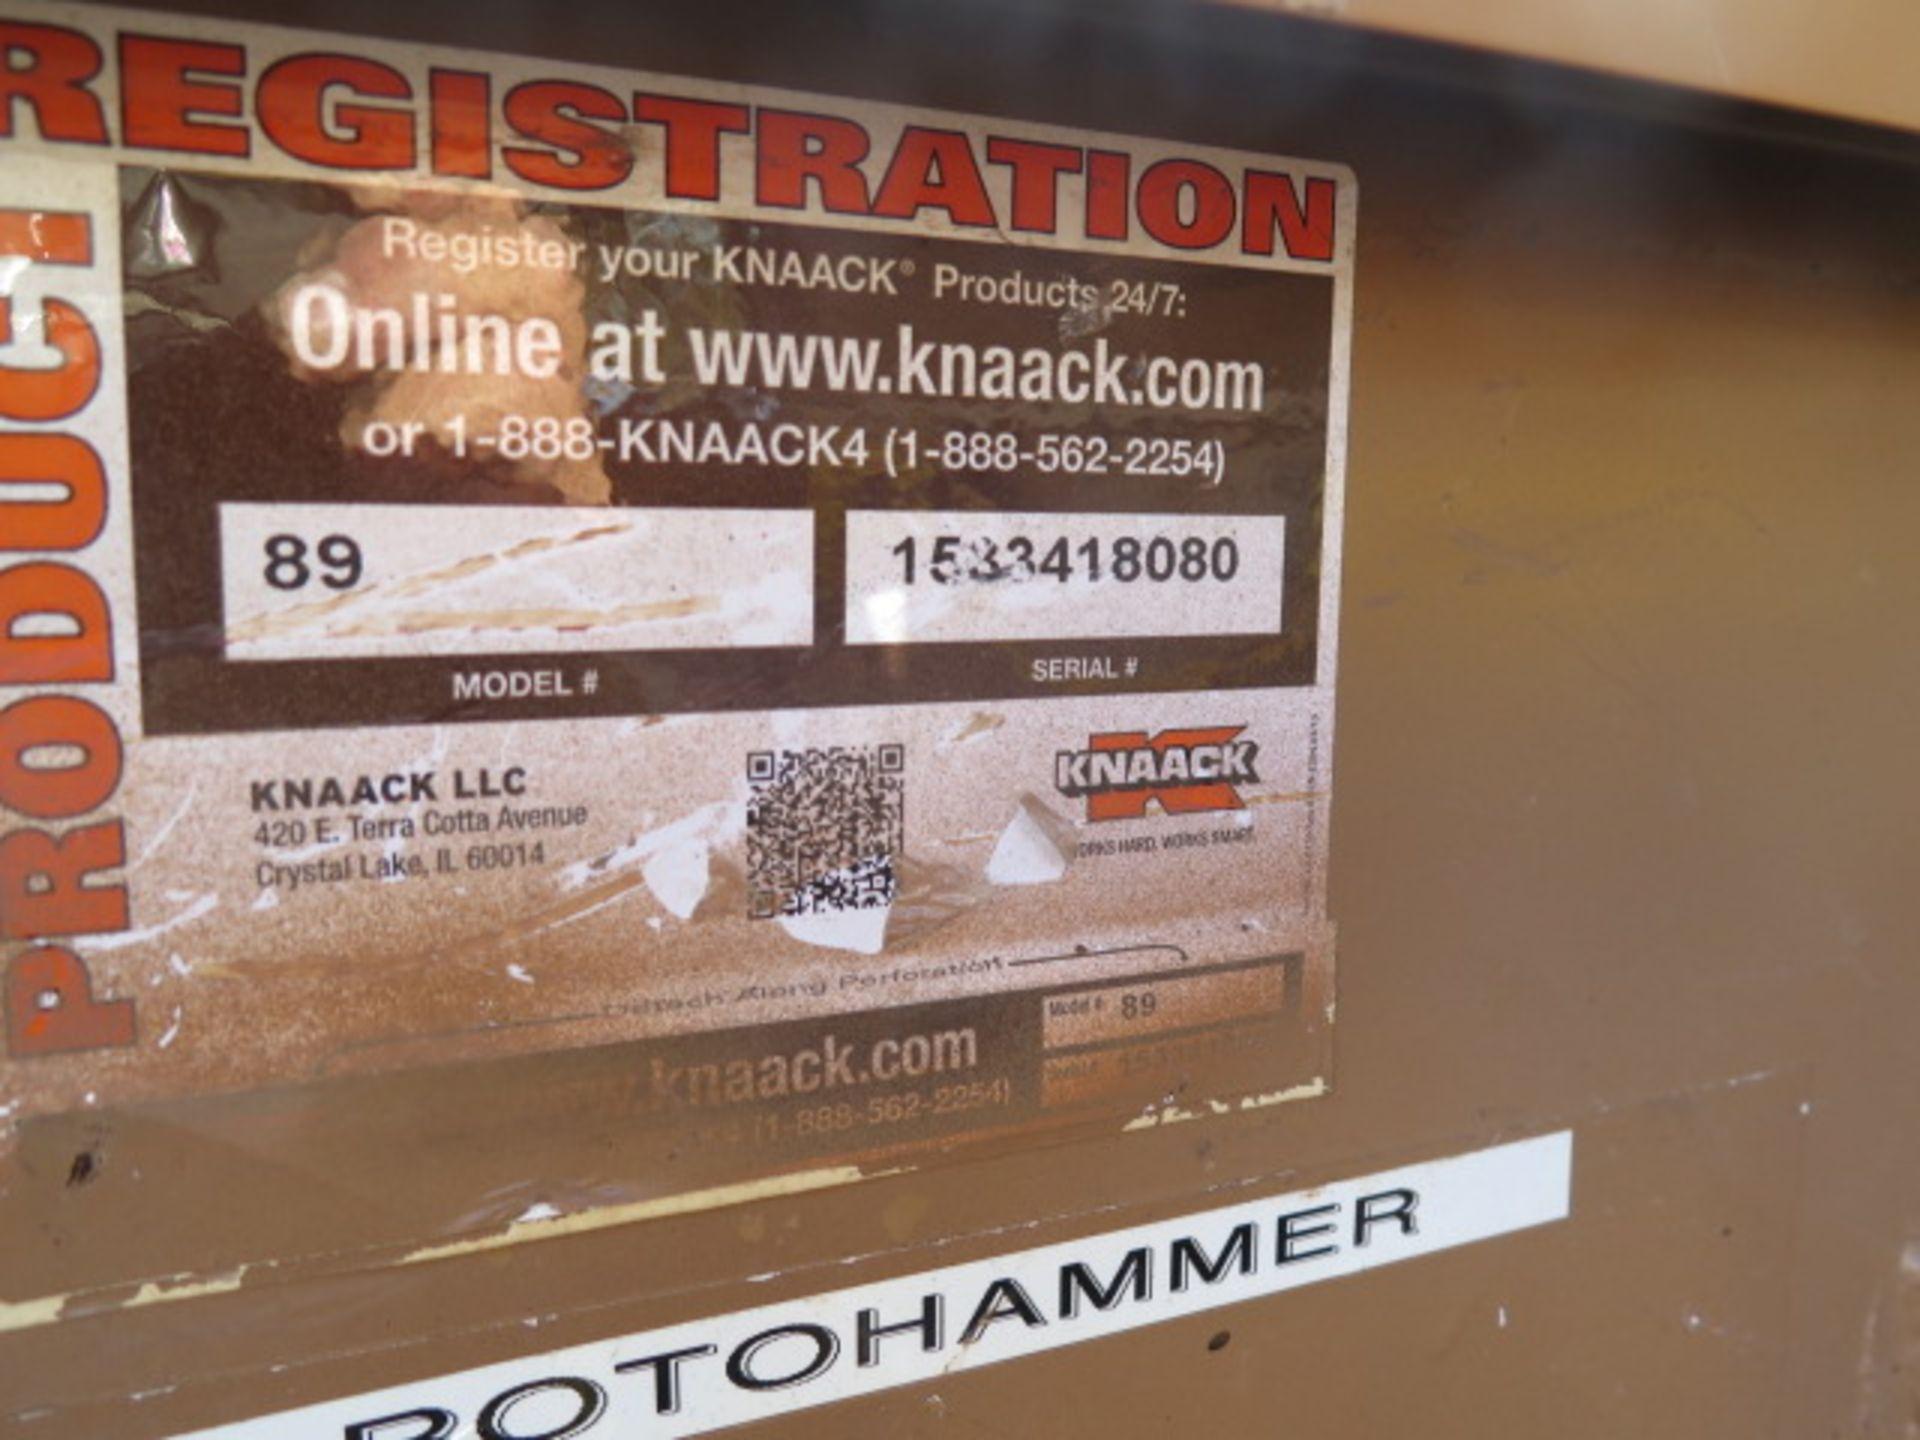 Knaack mdl. 89 Storagemaster Rolling Job Box (SOLD AS-IS - NO WARRANTY) - Image 12 of 12